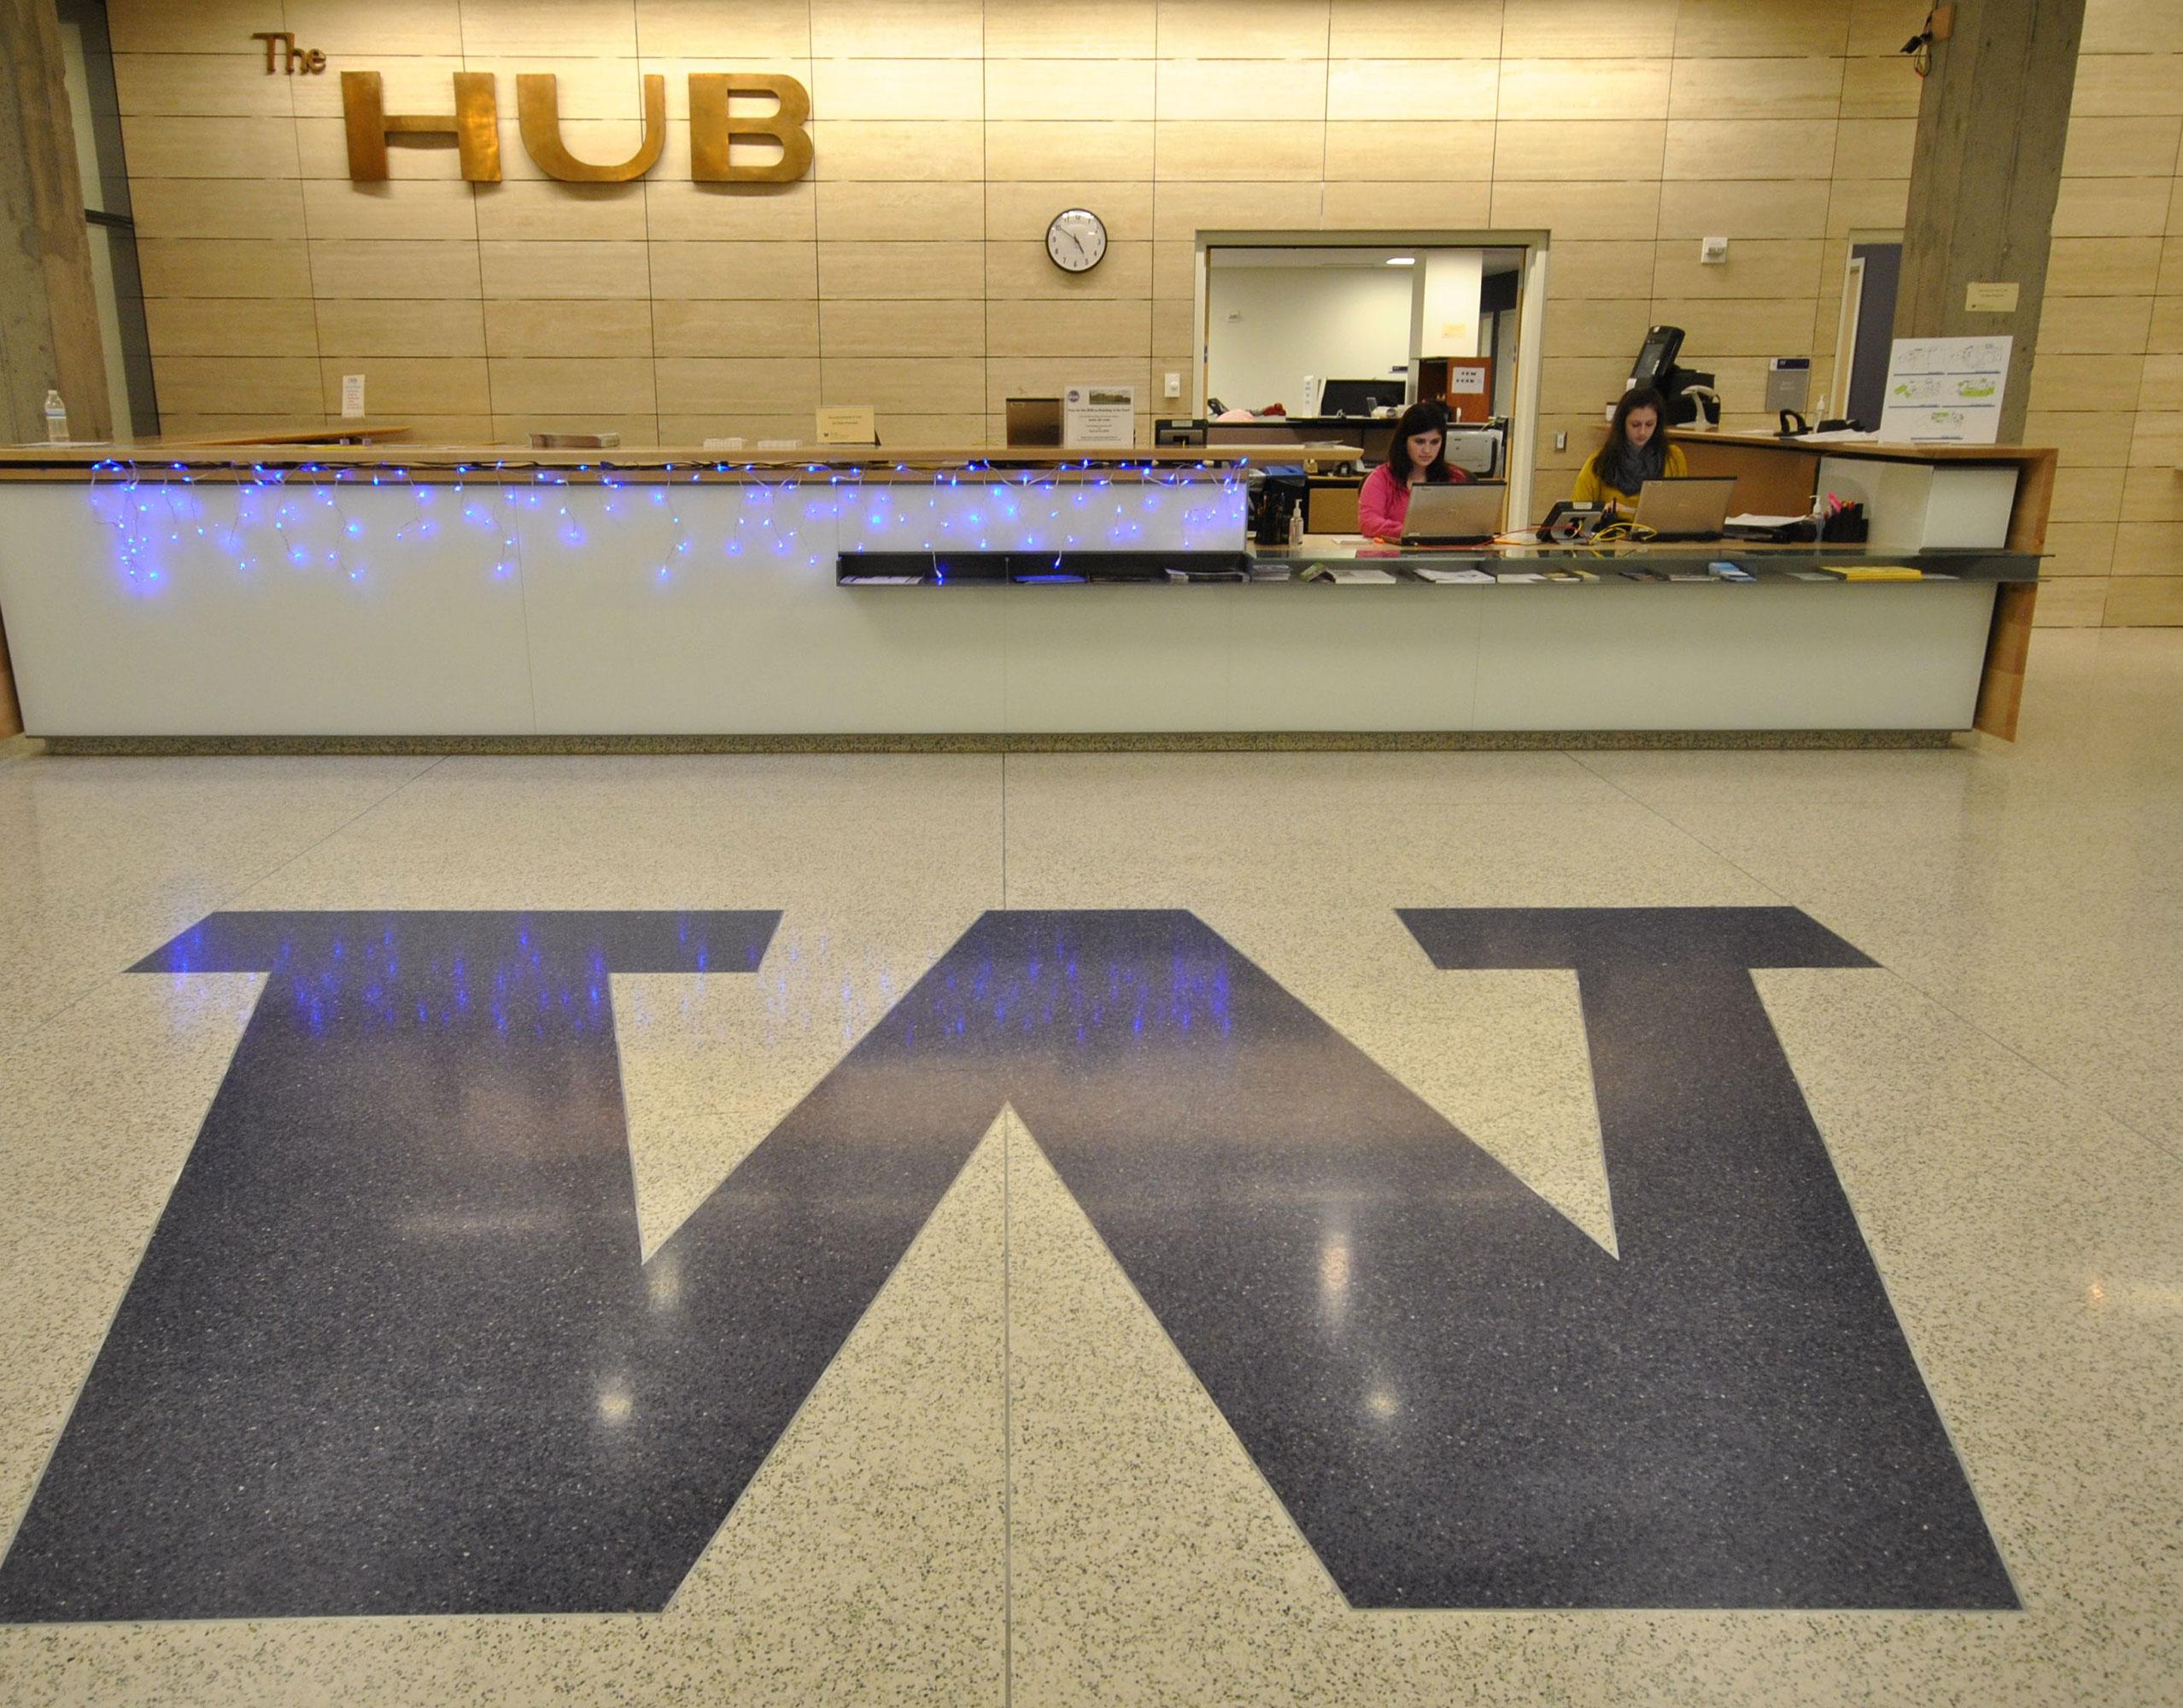 The HUB Main Desk